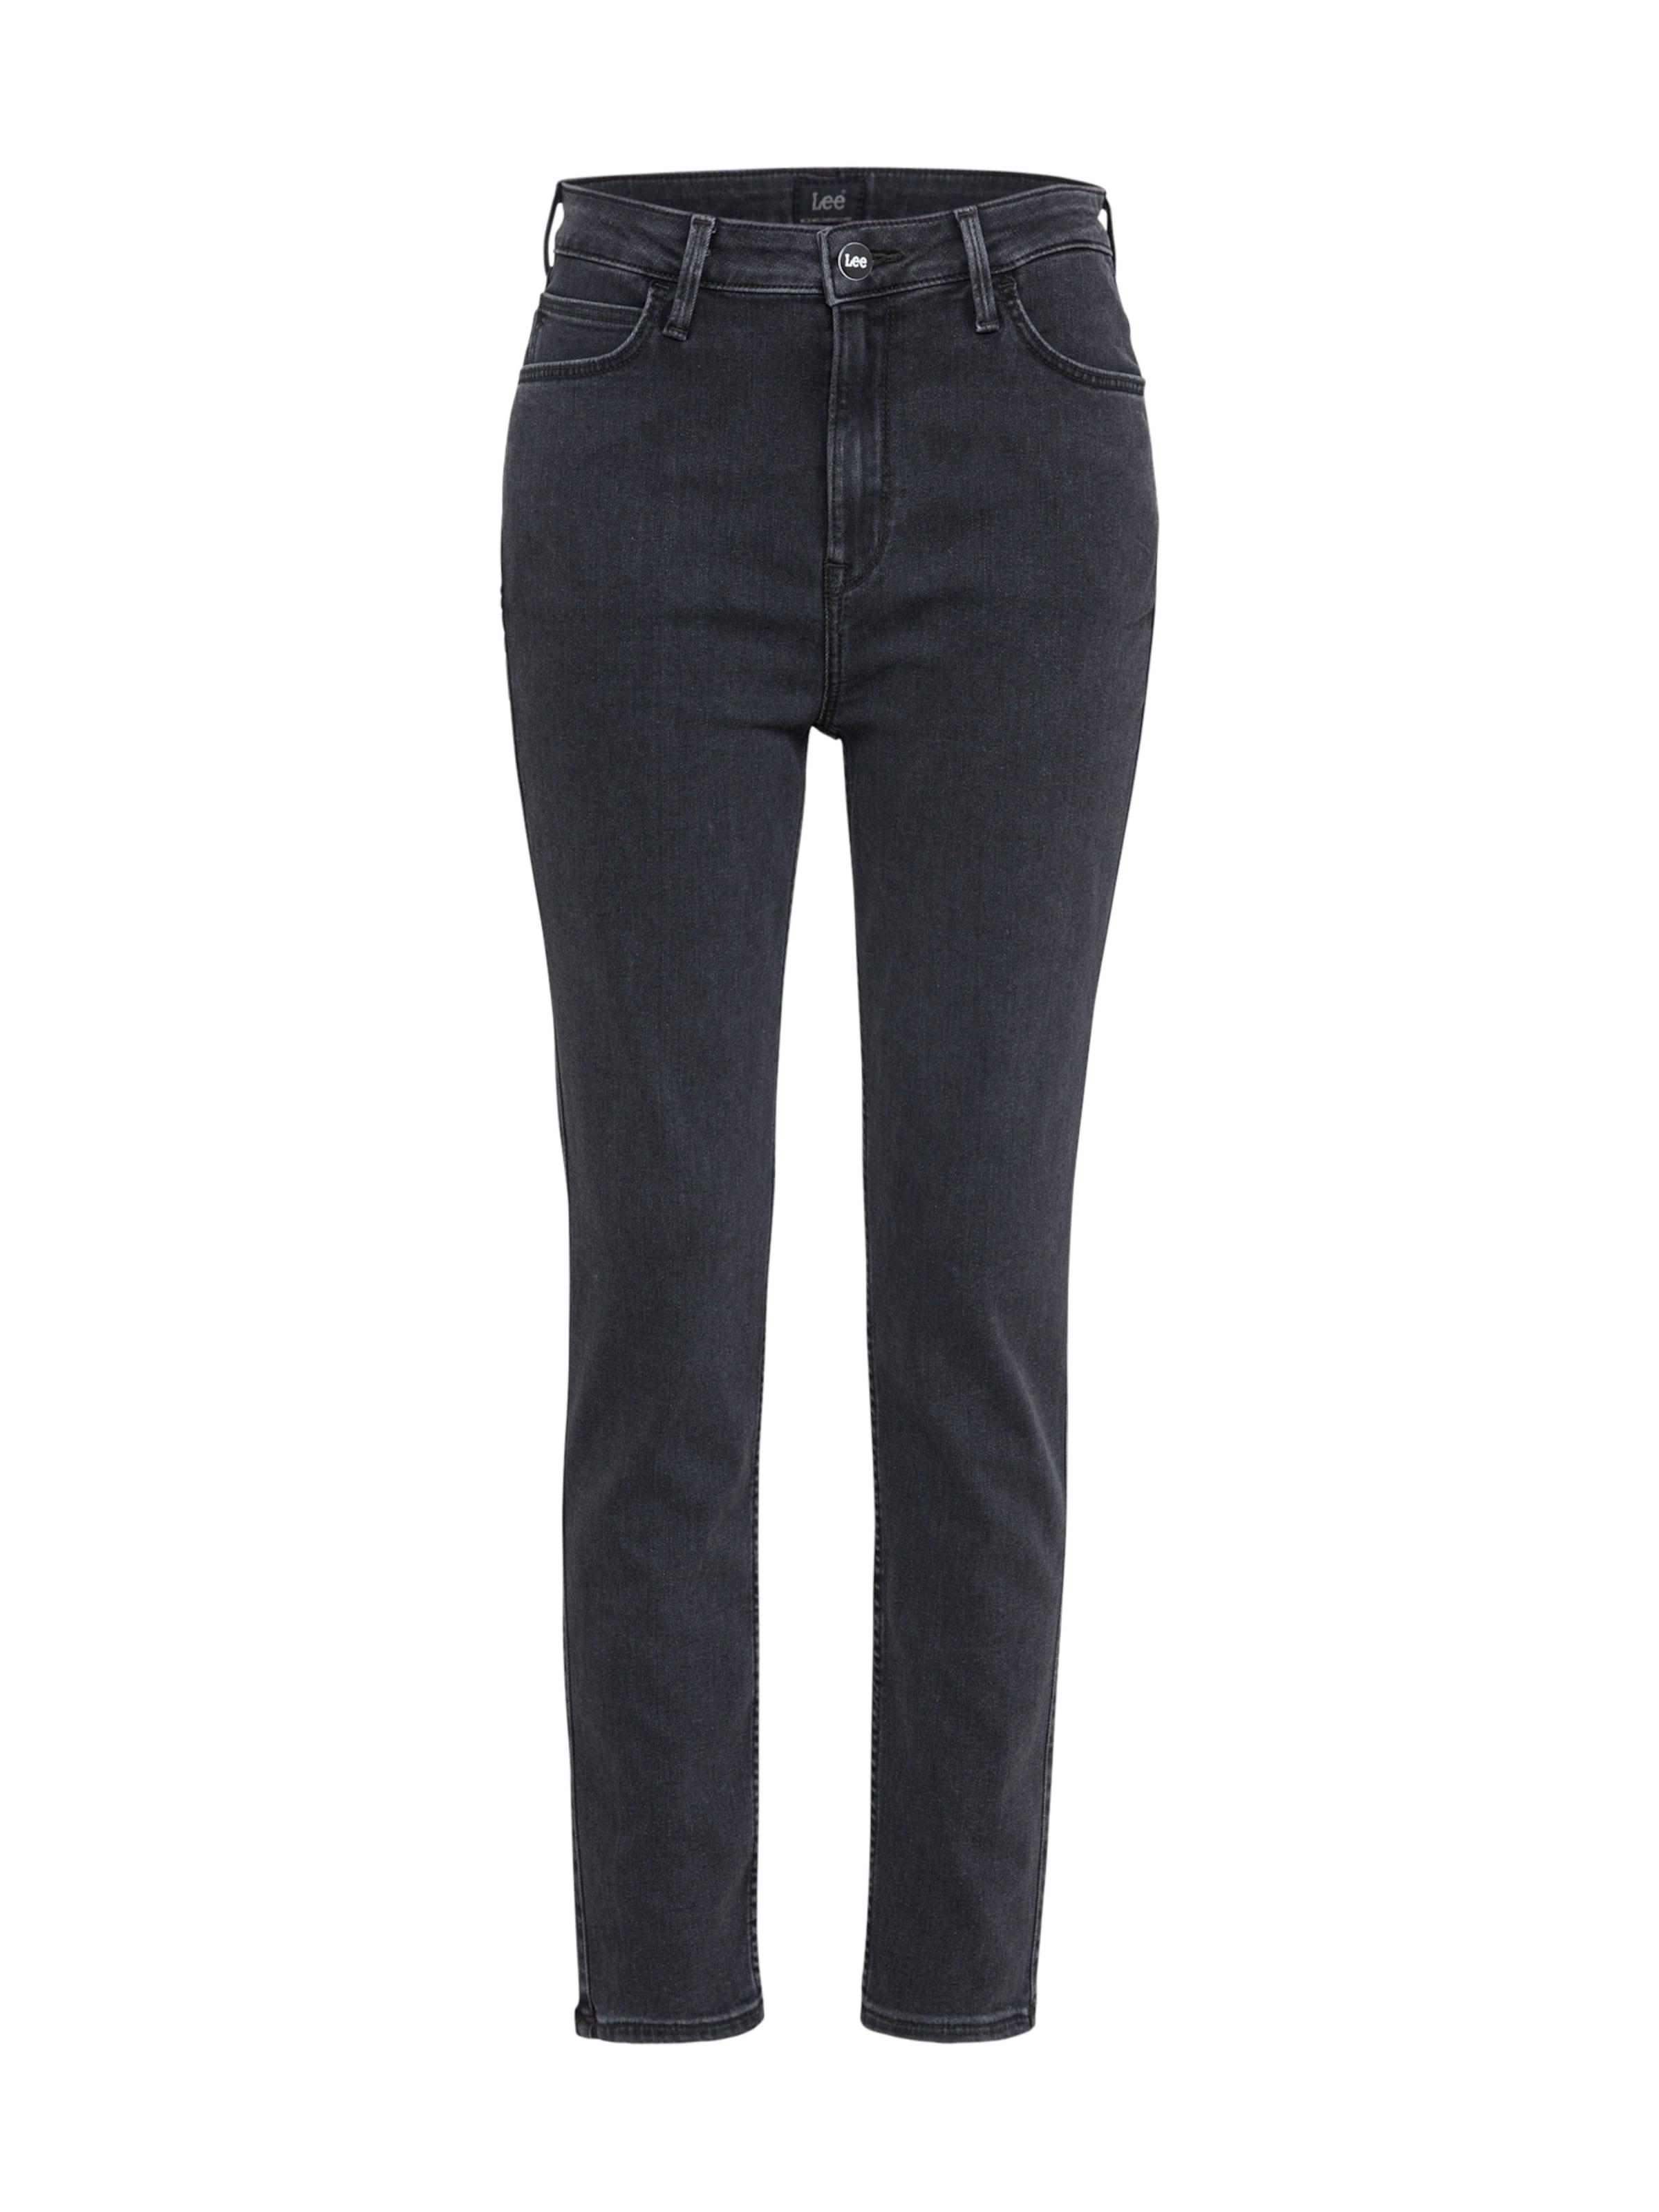 In Grey Lee Denim High' 'scarlett Jeans nOvwN80m